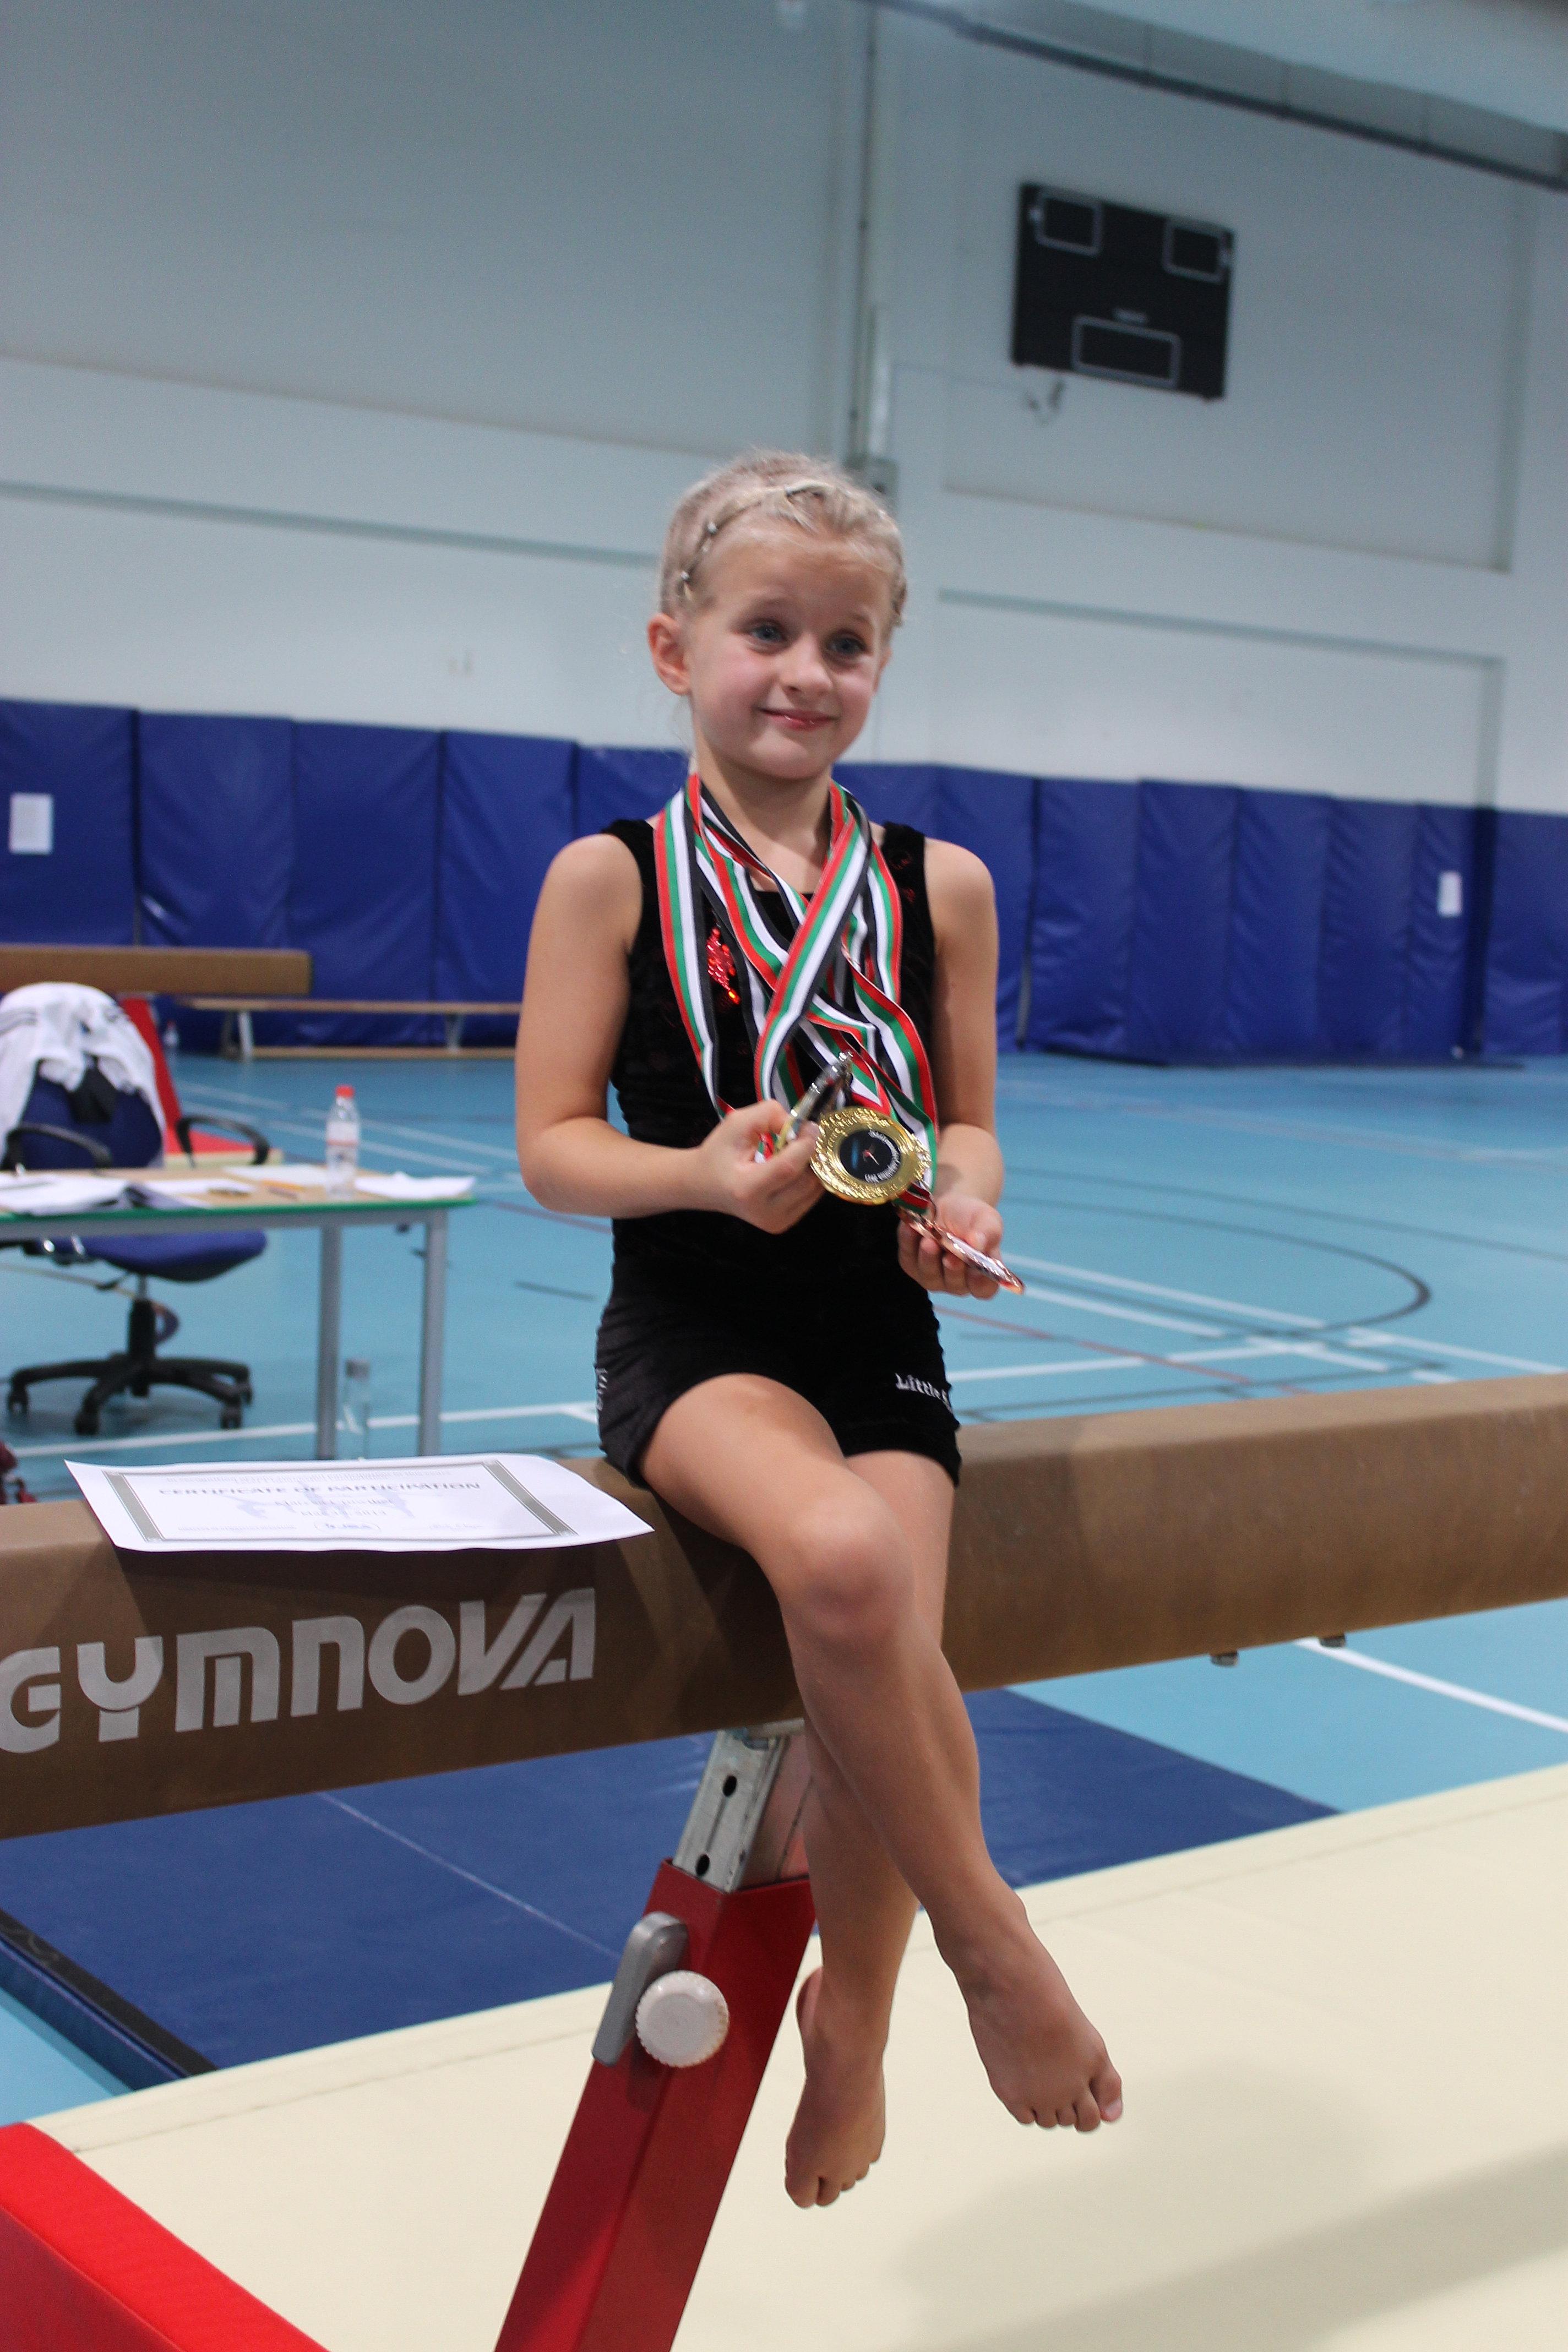 carolina classic 2014 gymnastics meet results